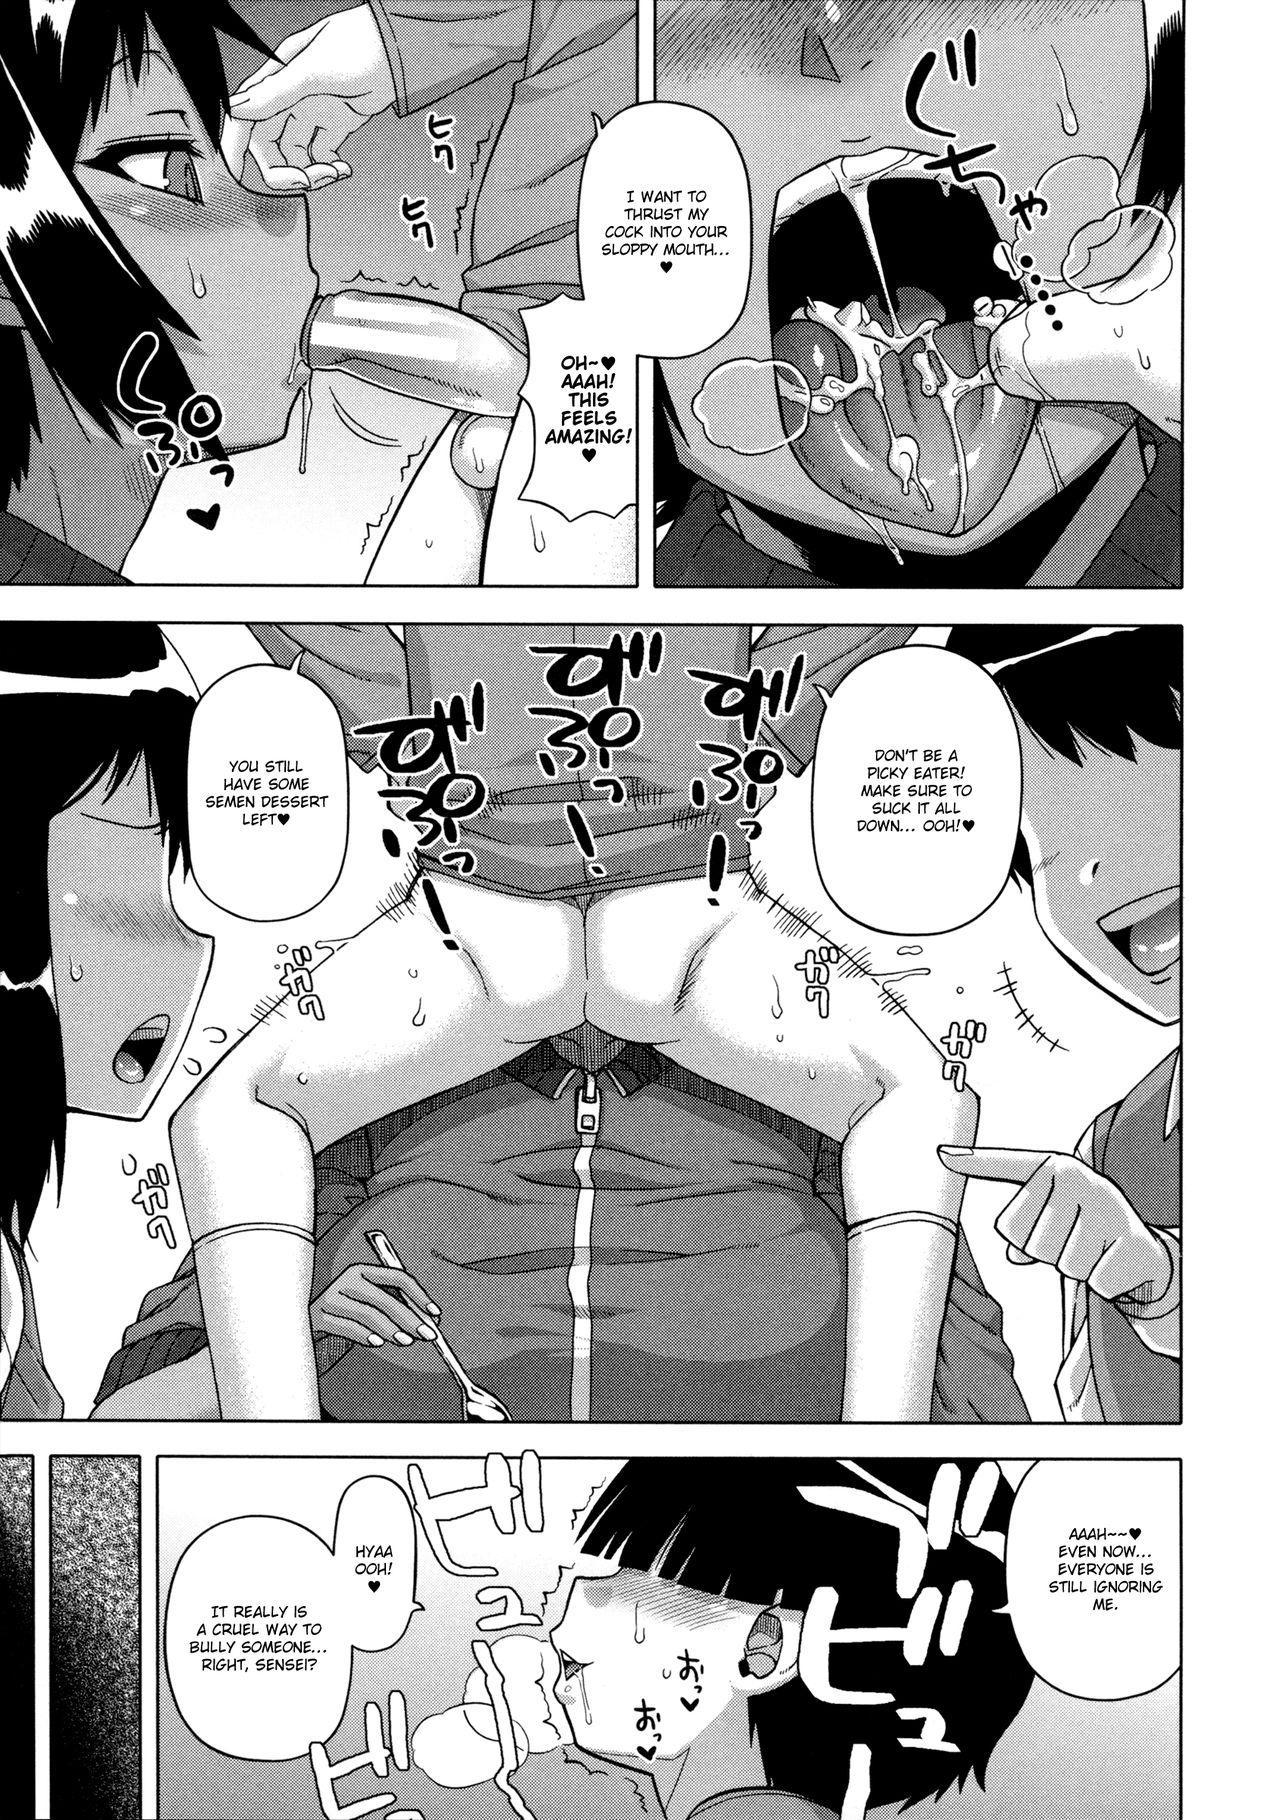 [Takatsu] Ou-sama Appli - King App [English] [TheRobotsGhost] 52